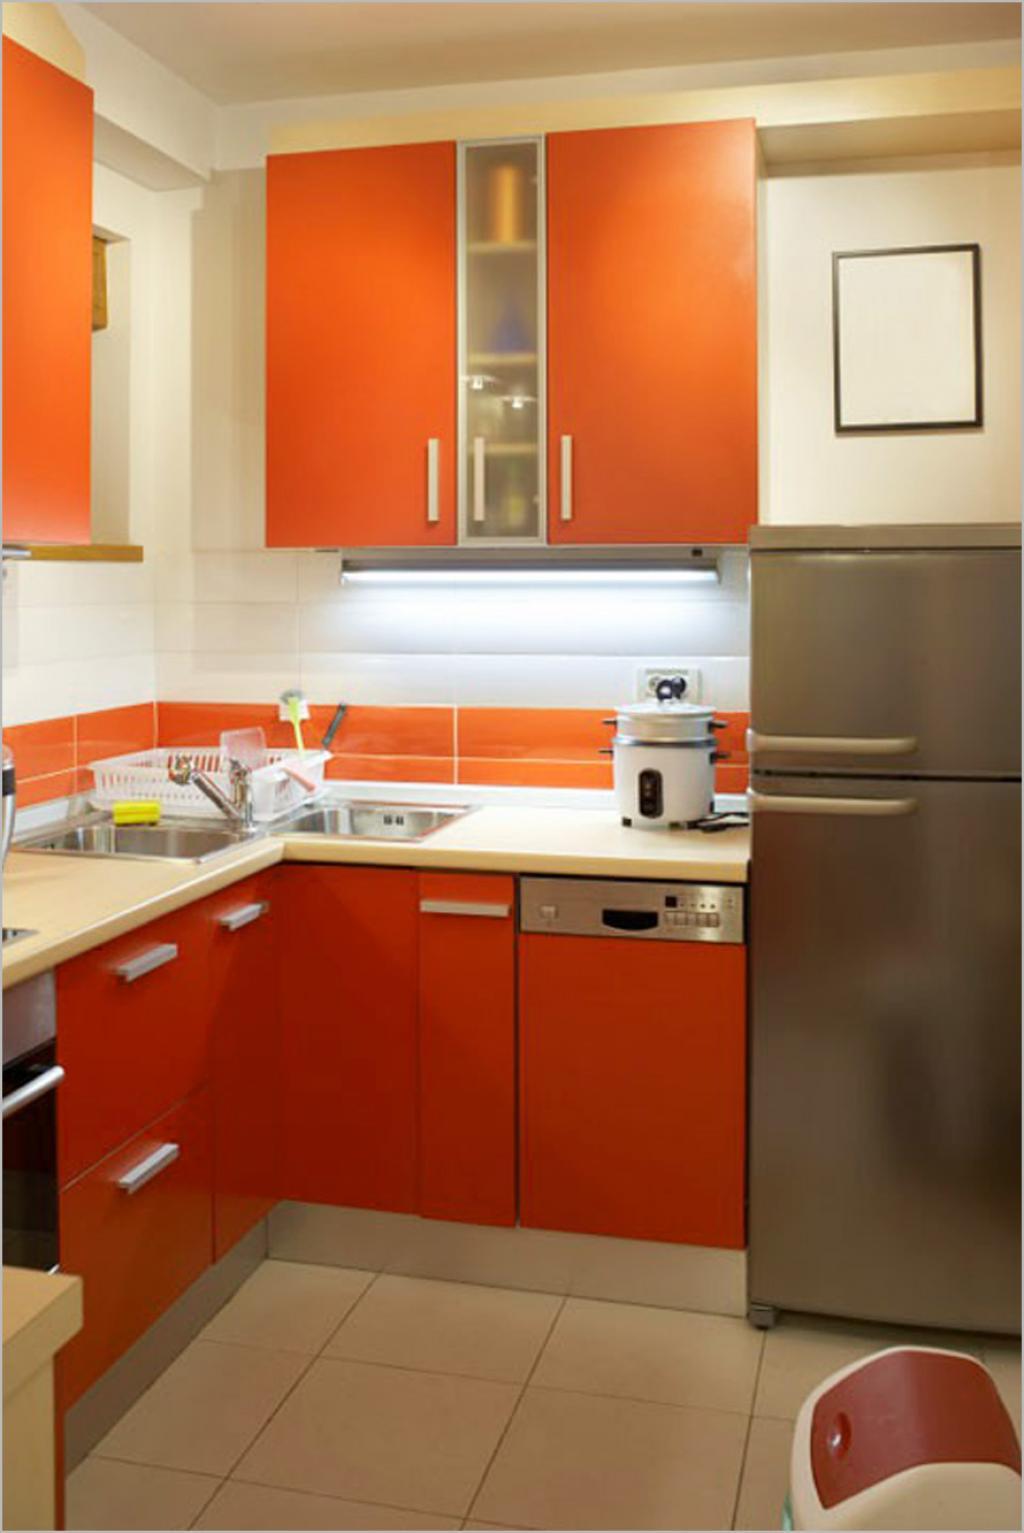 small kitchens designs photo - 2